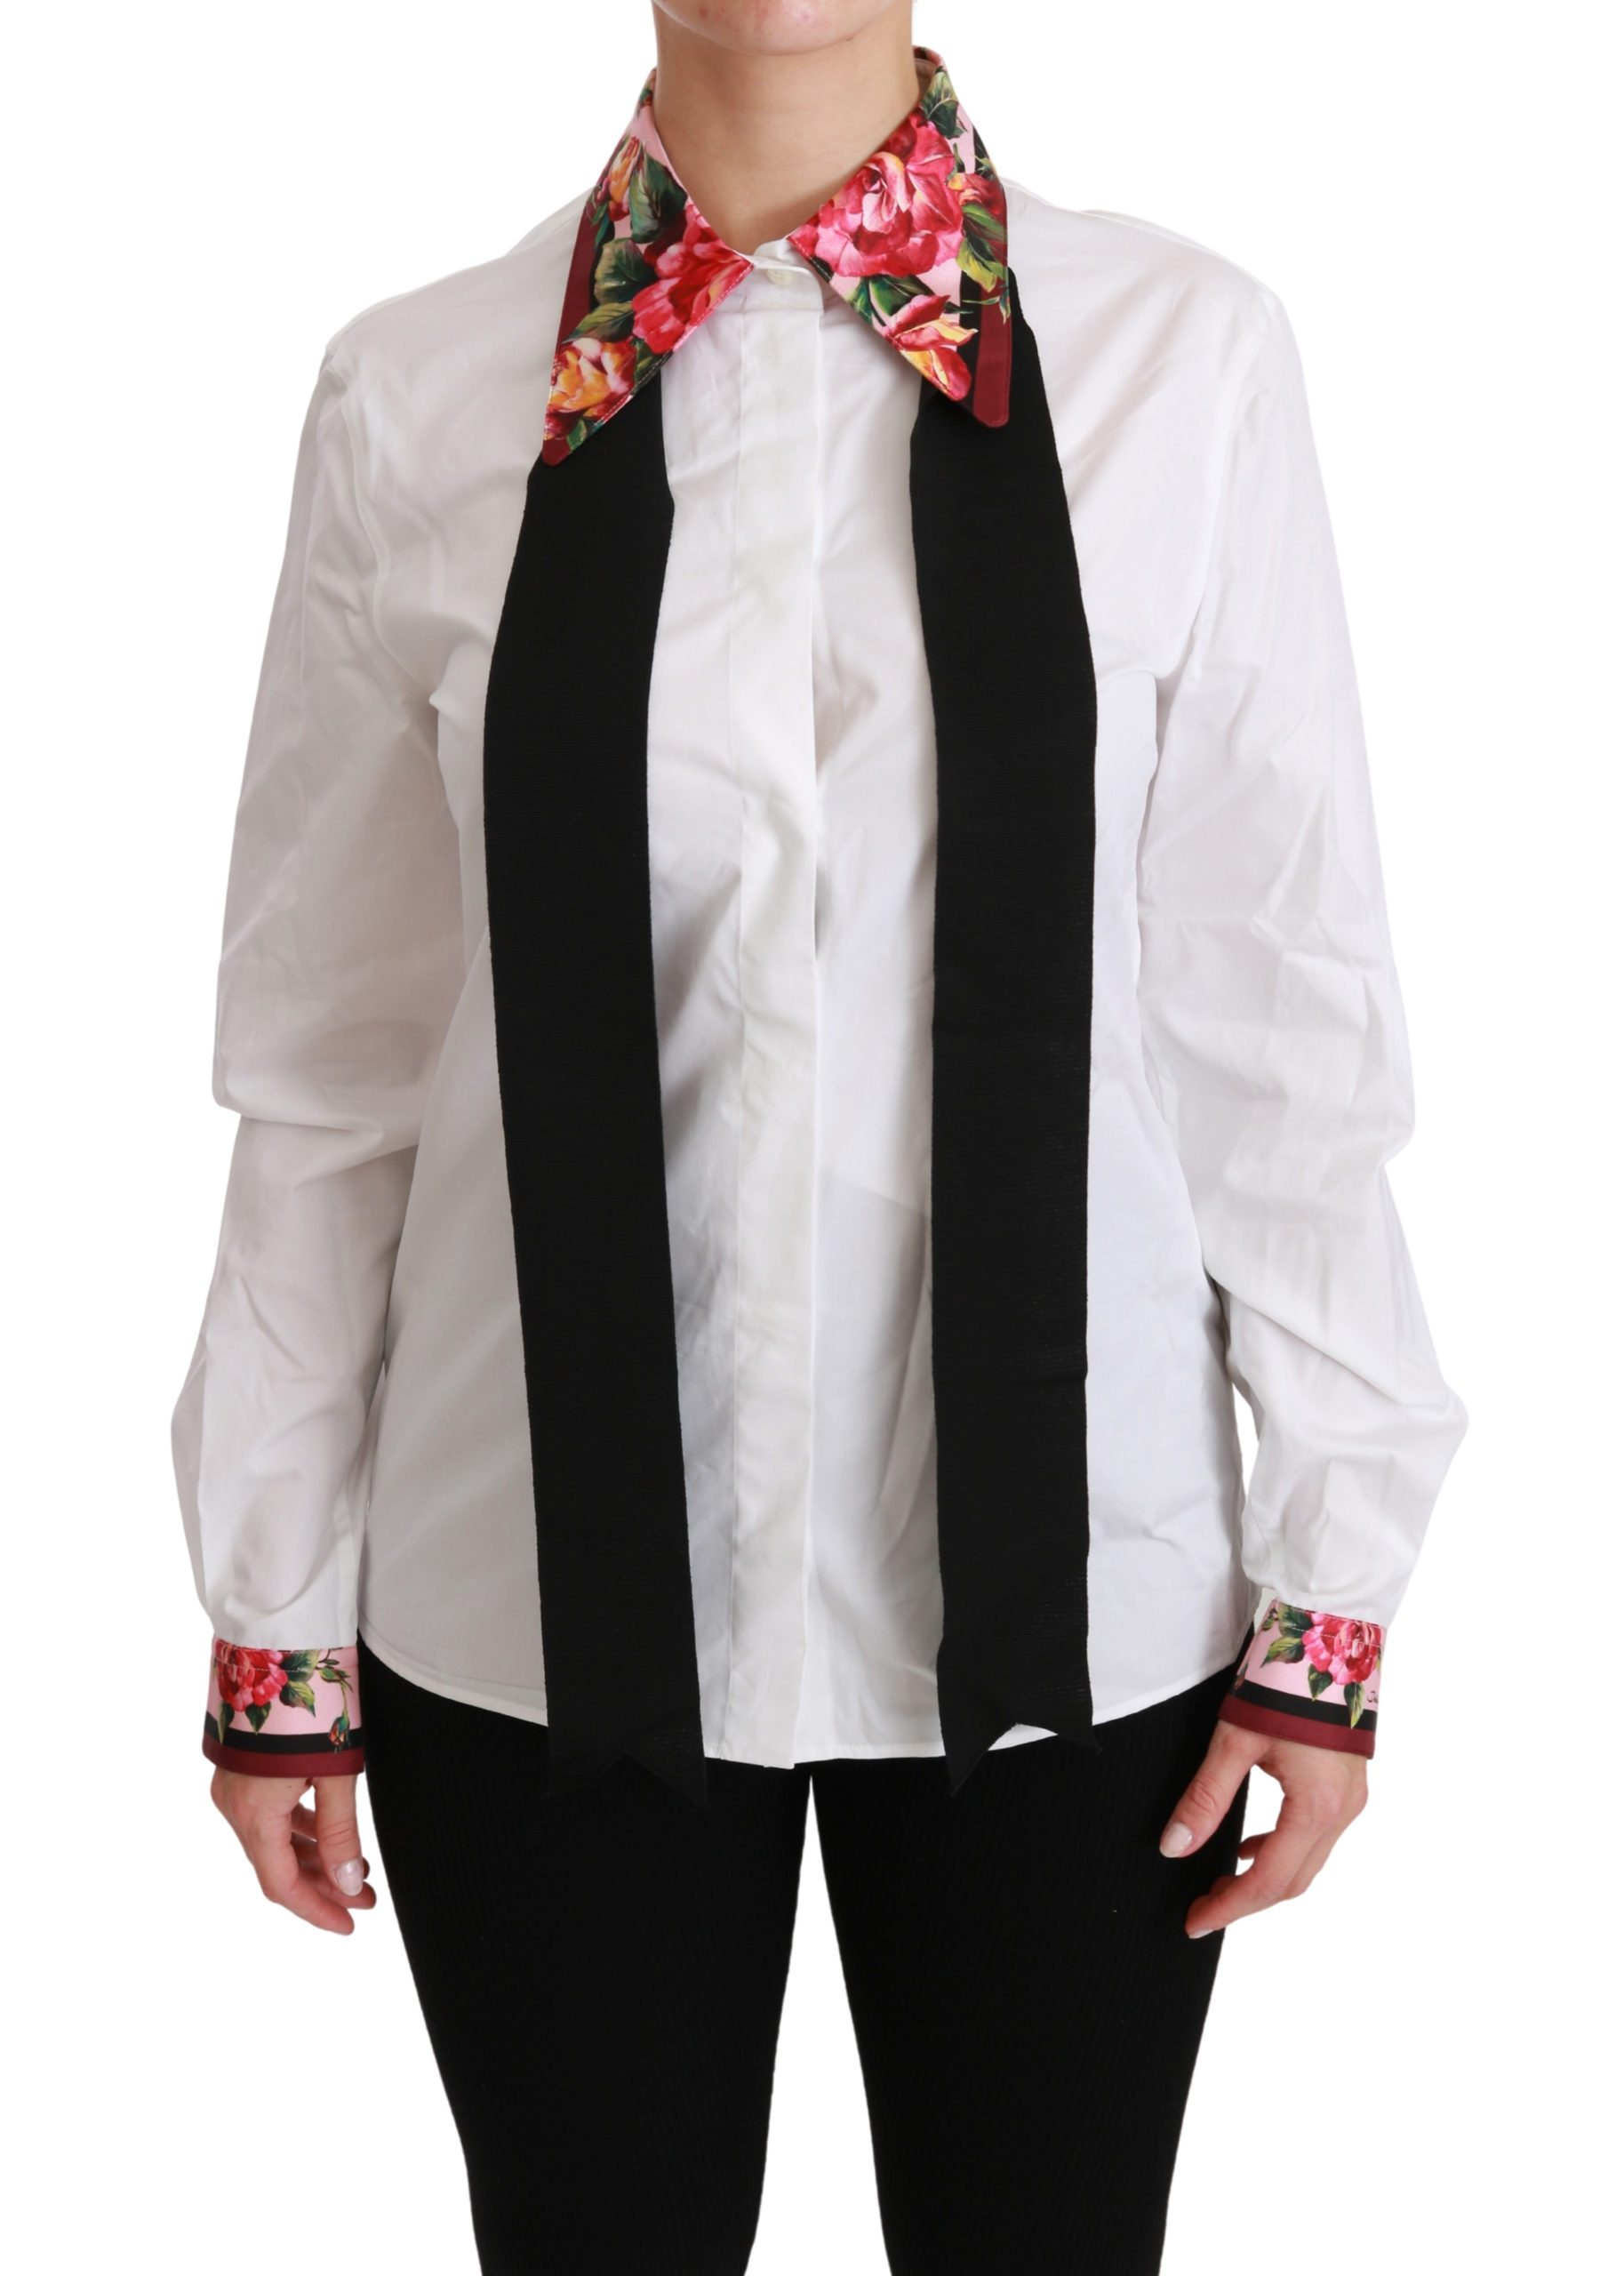 Dolce & Gabbana Women's Floral LS Shirt White TSH4407 - IT42|M